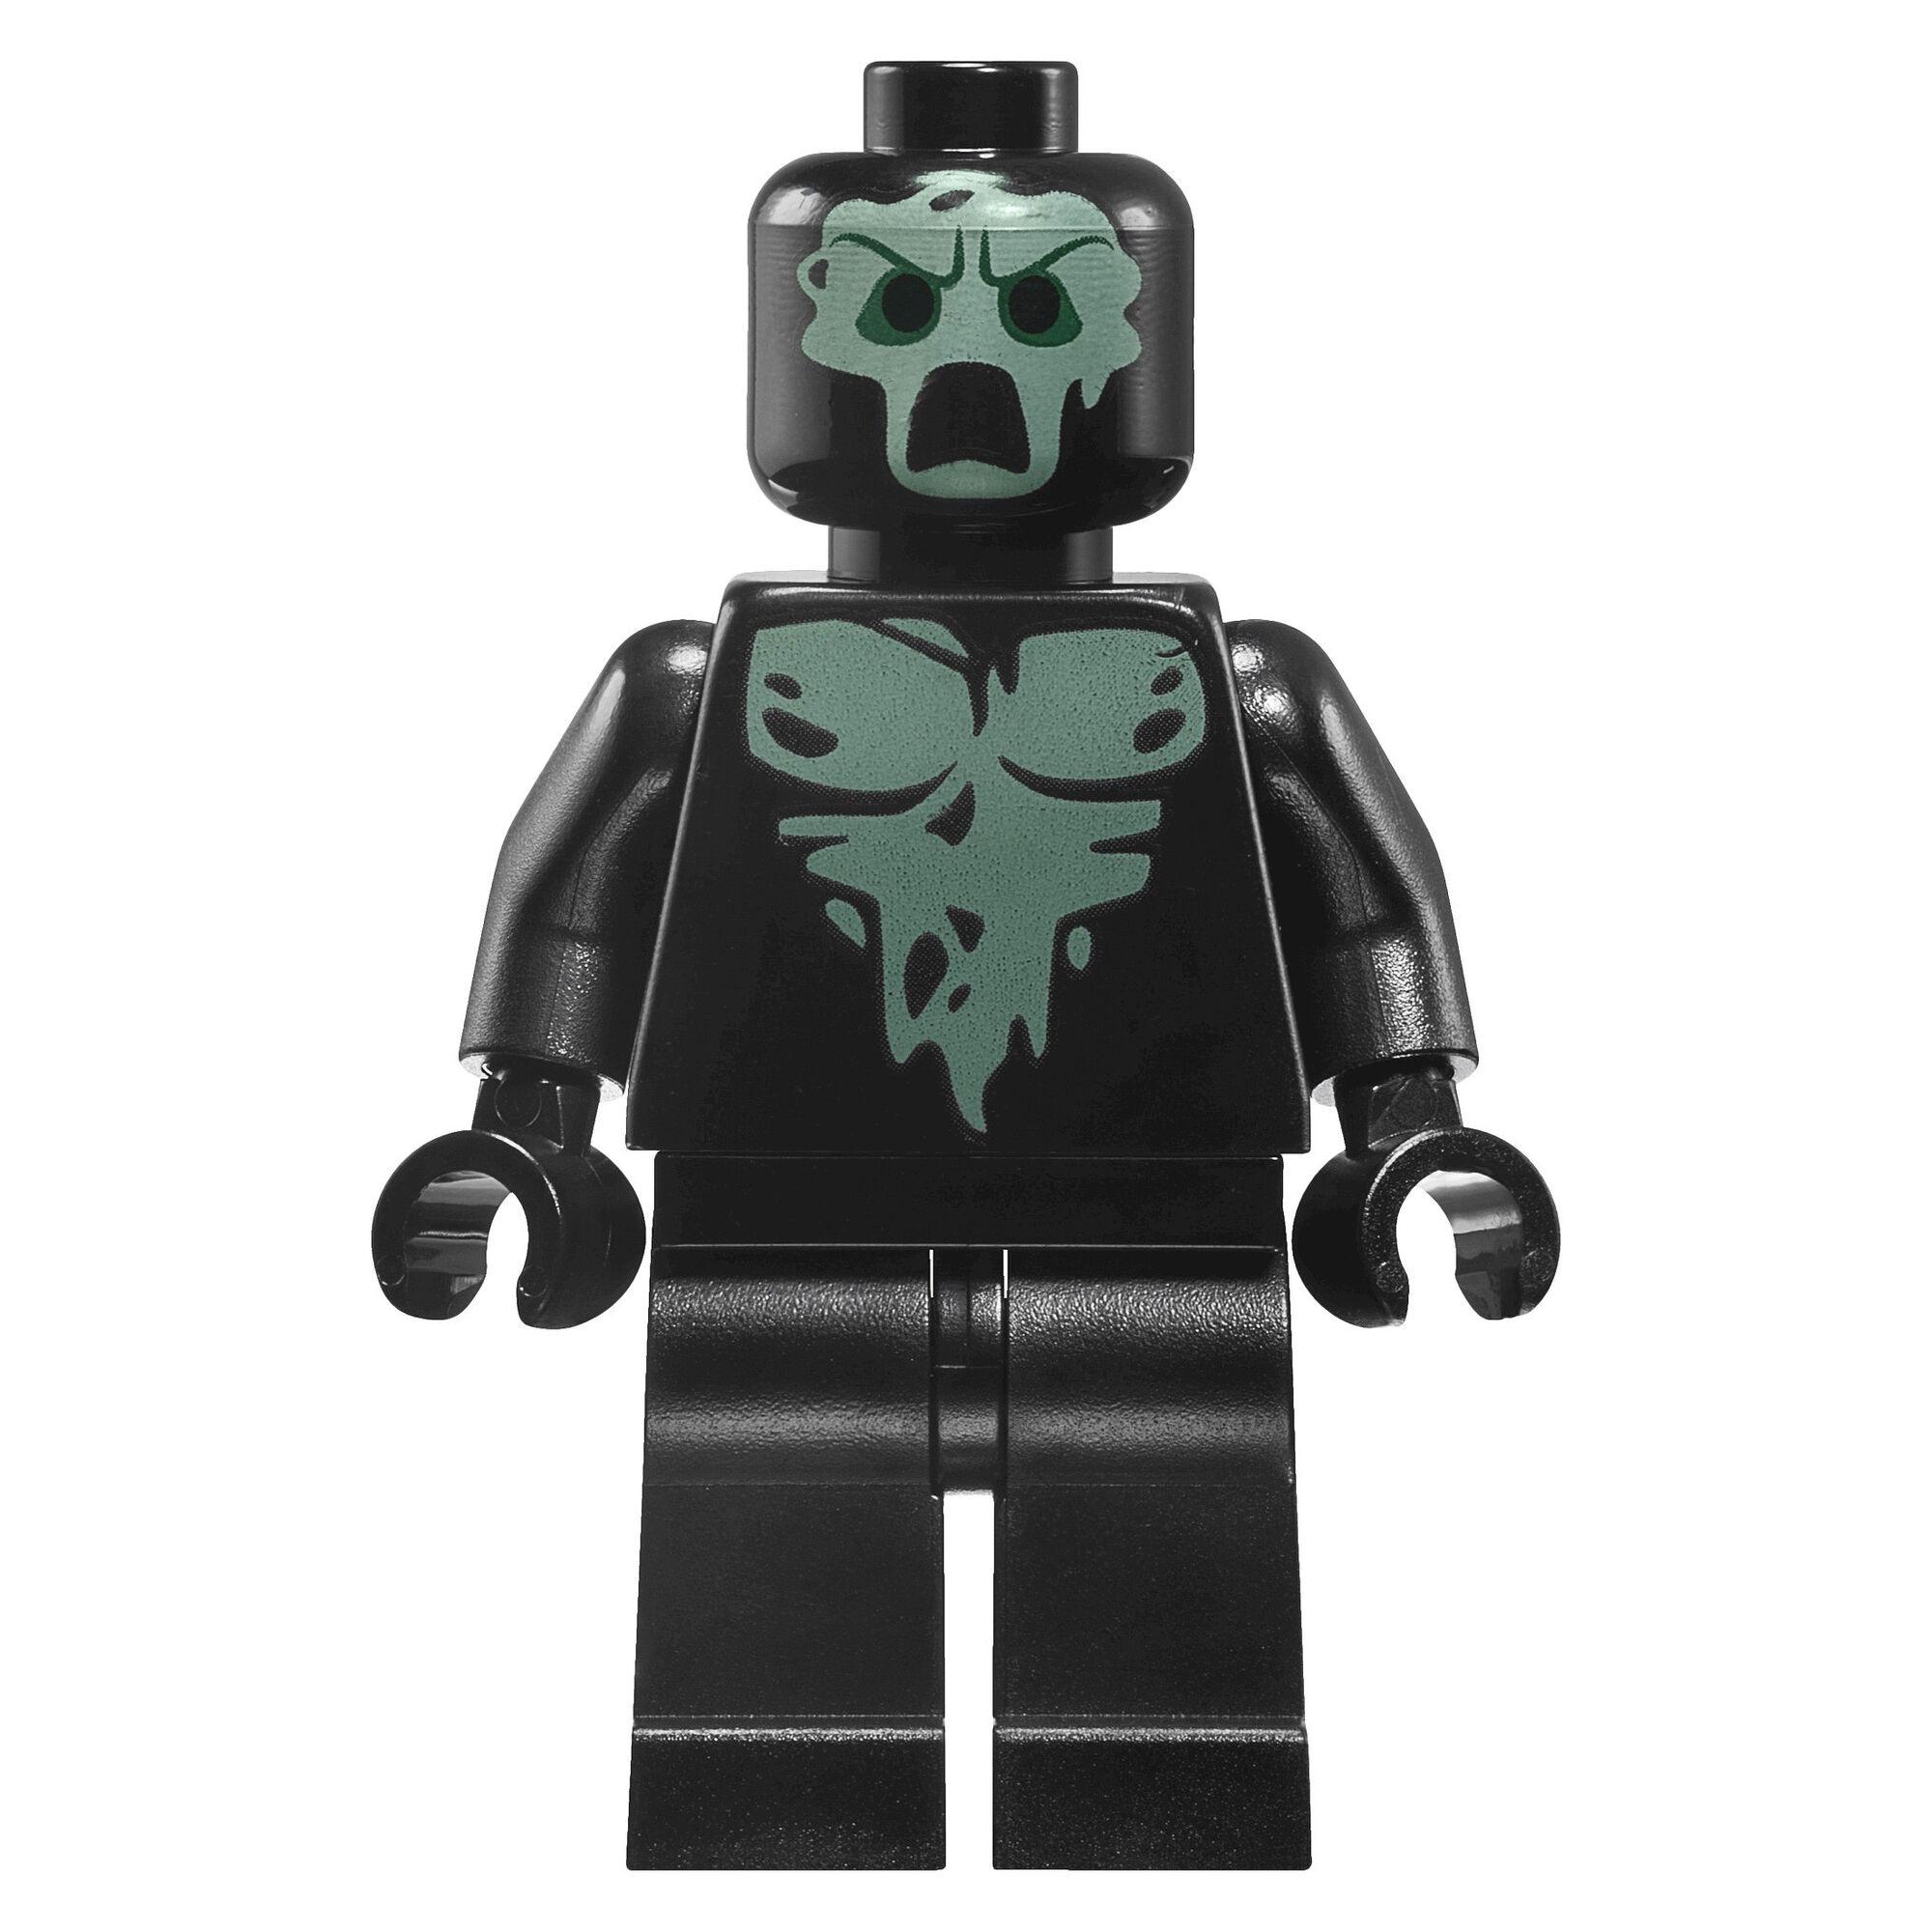 Necromancer Of Dol Guldur Brickipedia Fandom Powered